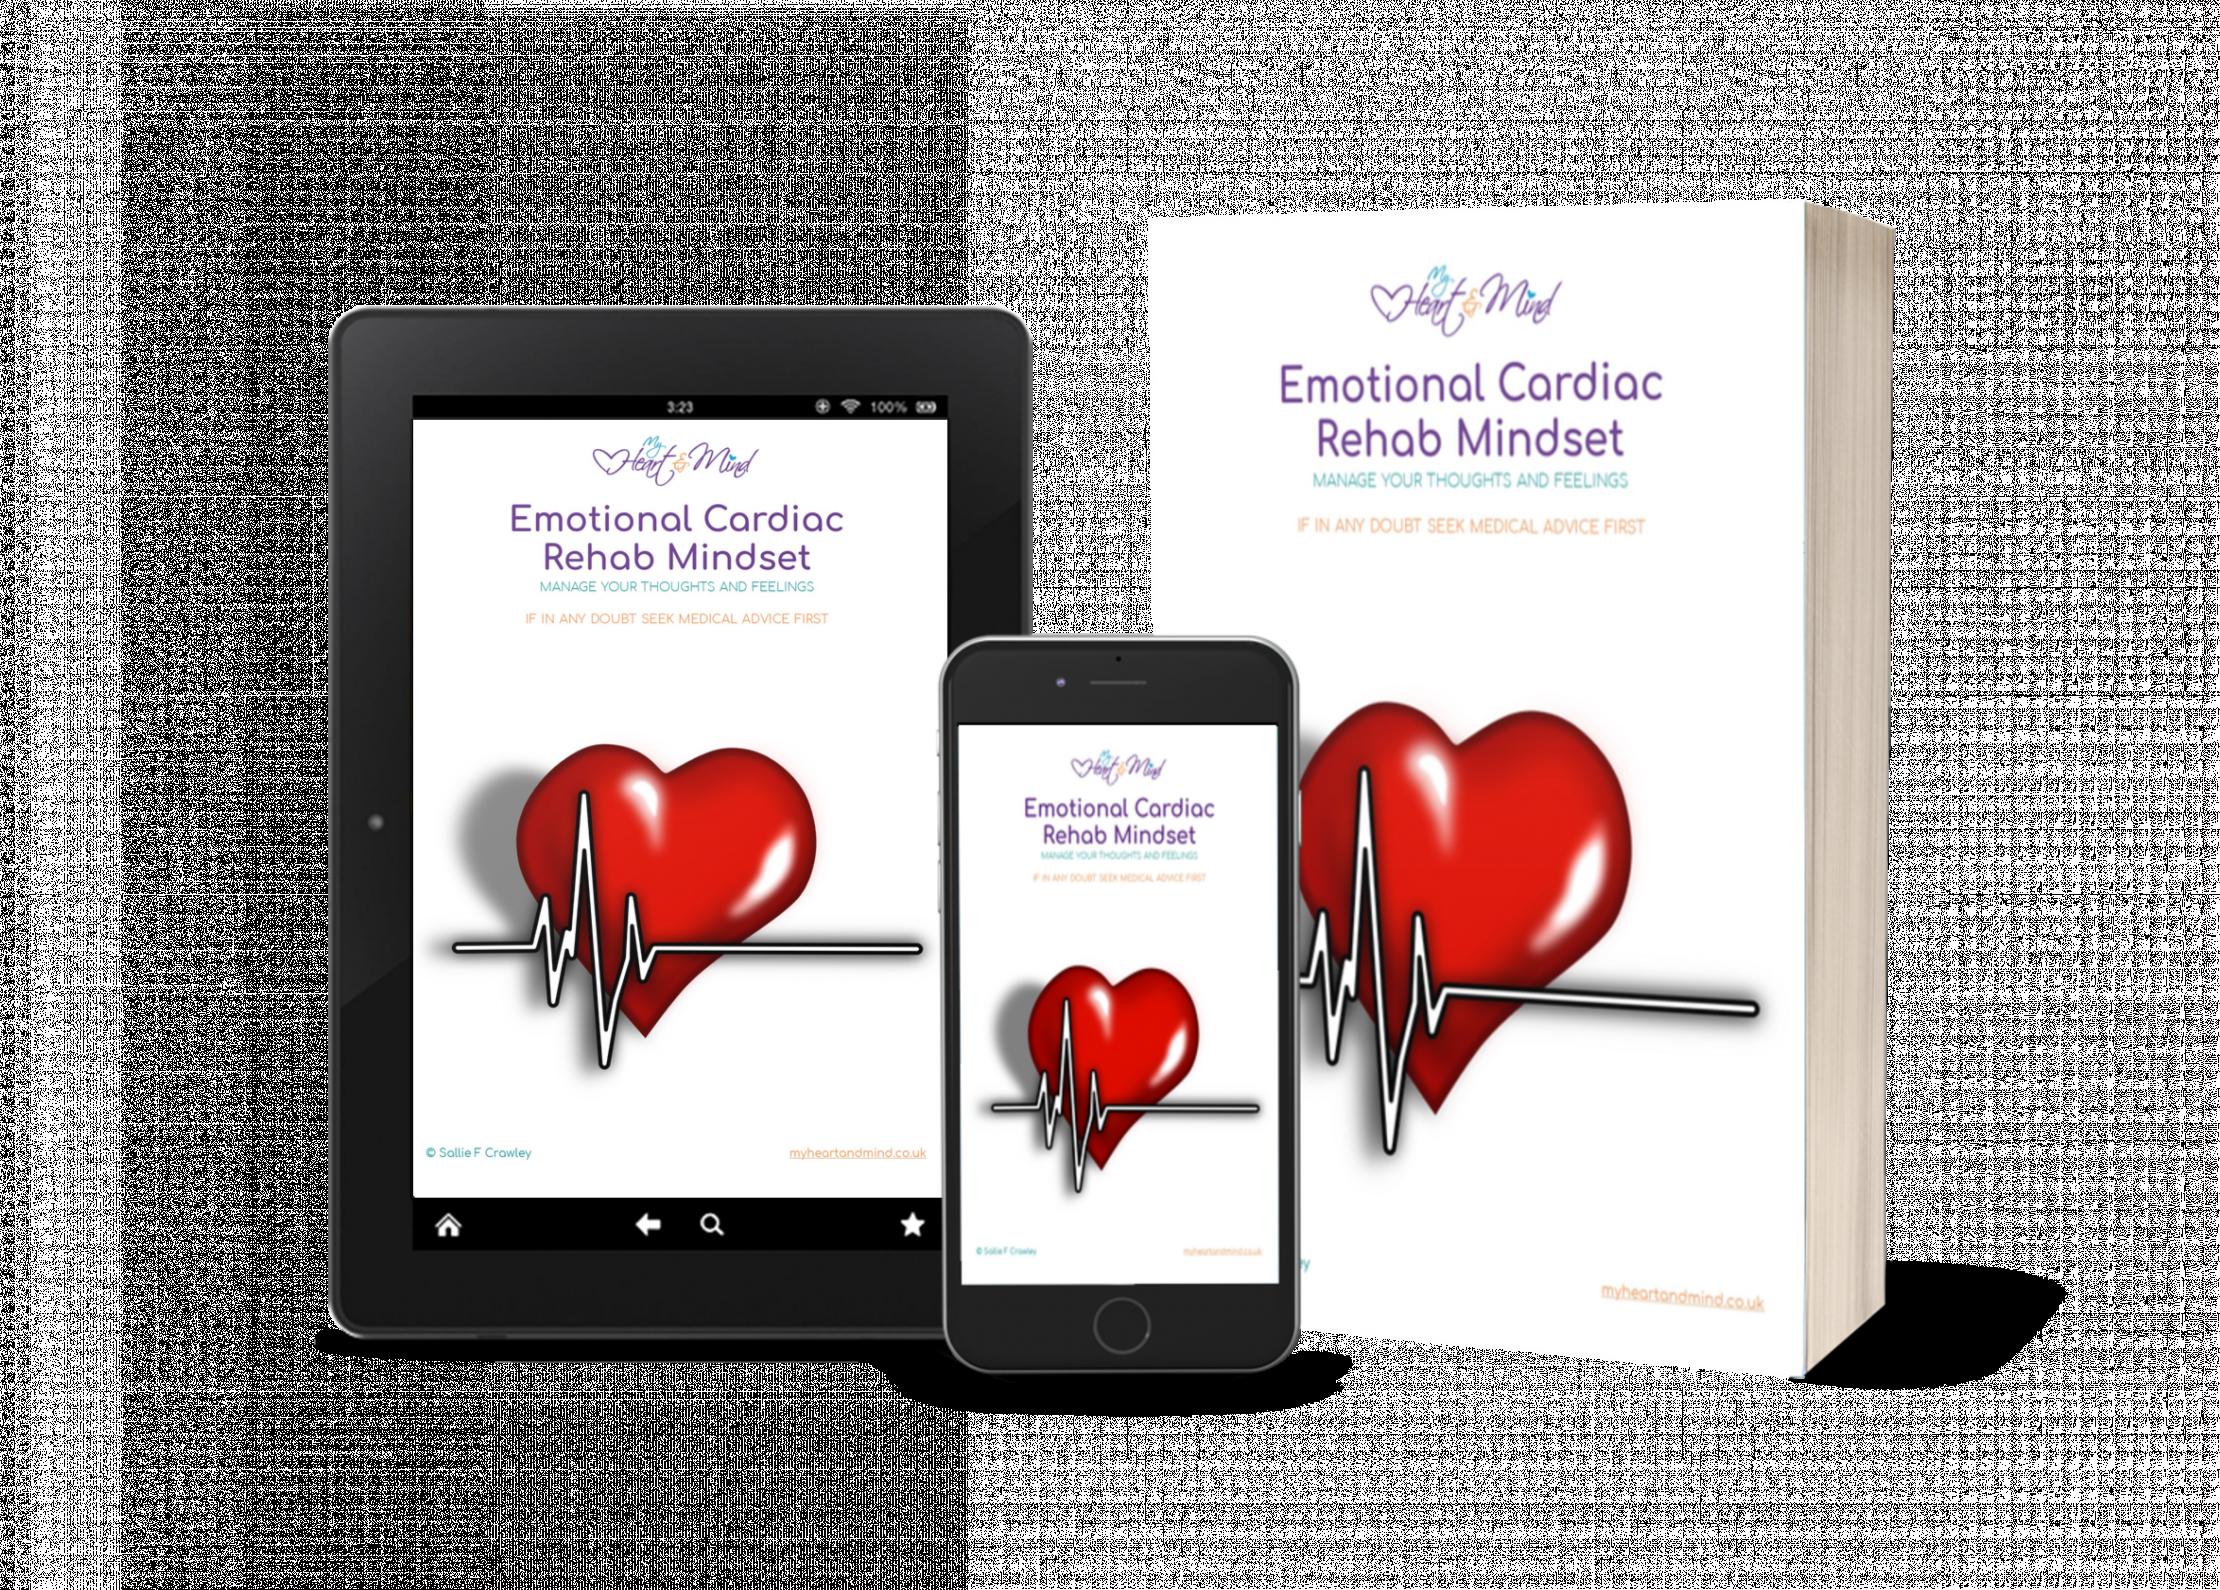 Emotional Cardiac Rehabilitation FREE booklet